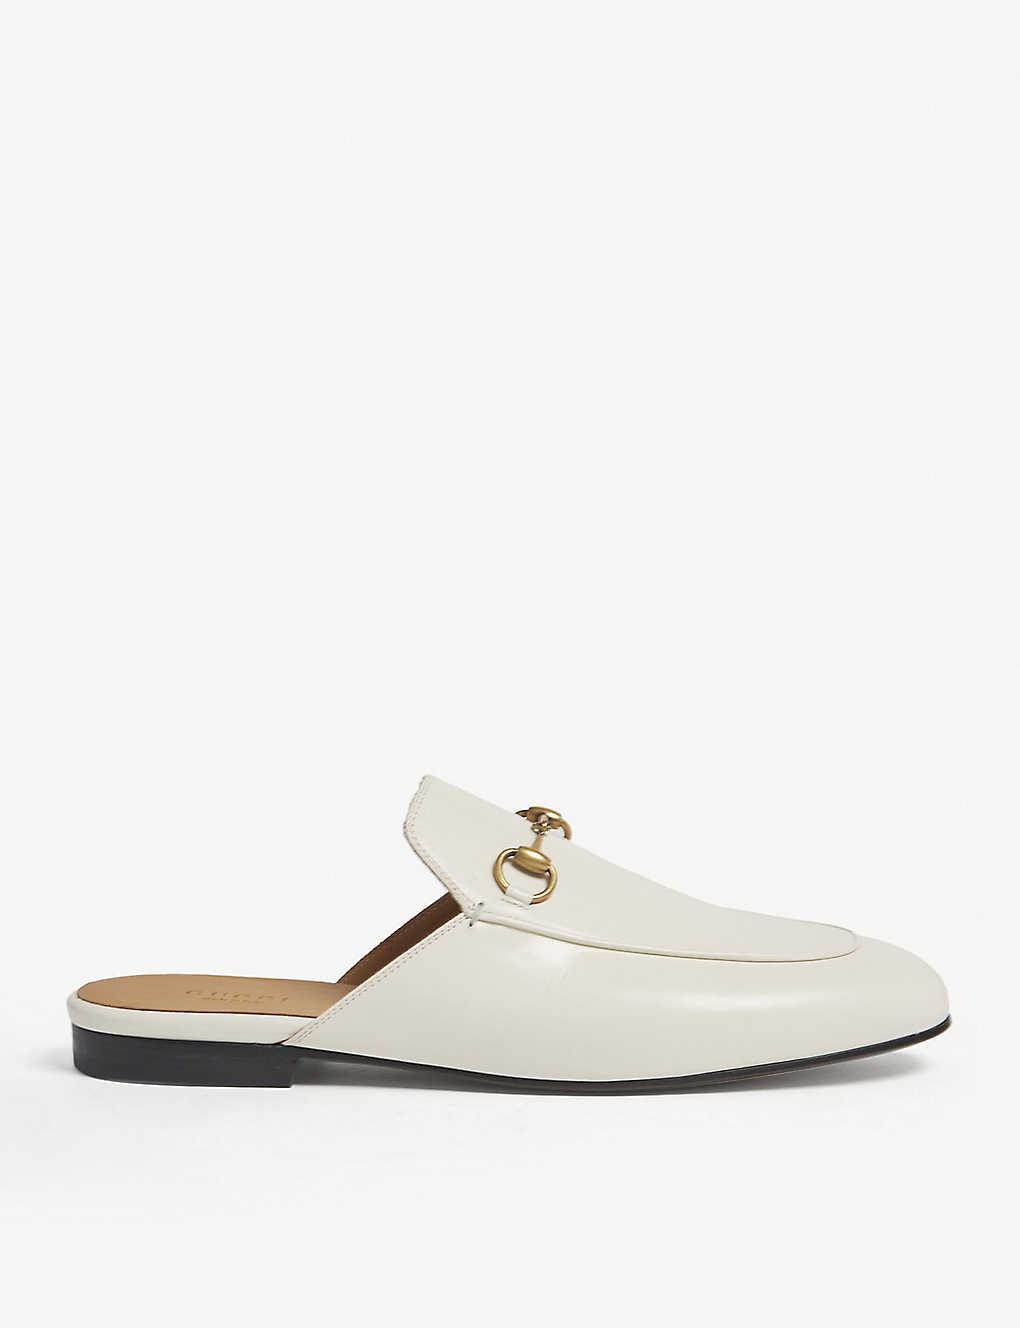 55d0534bb GUCCI - Princetown leather slippers | Selfridges.com